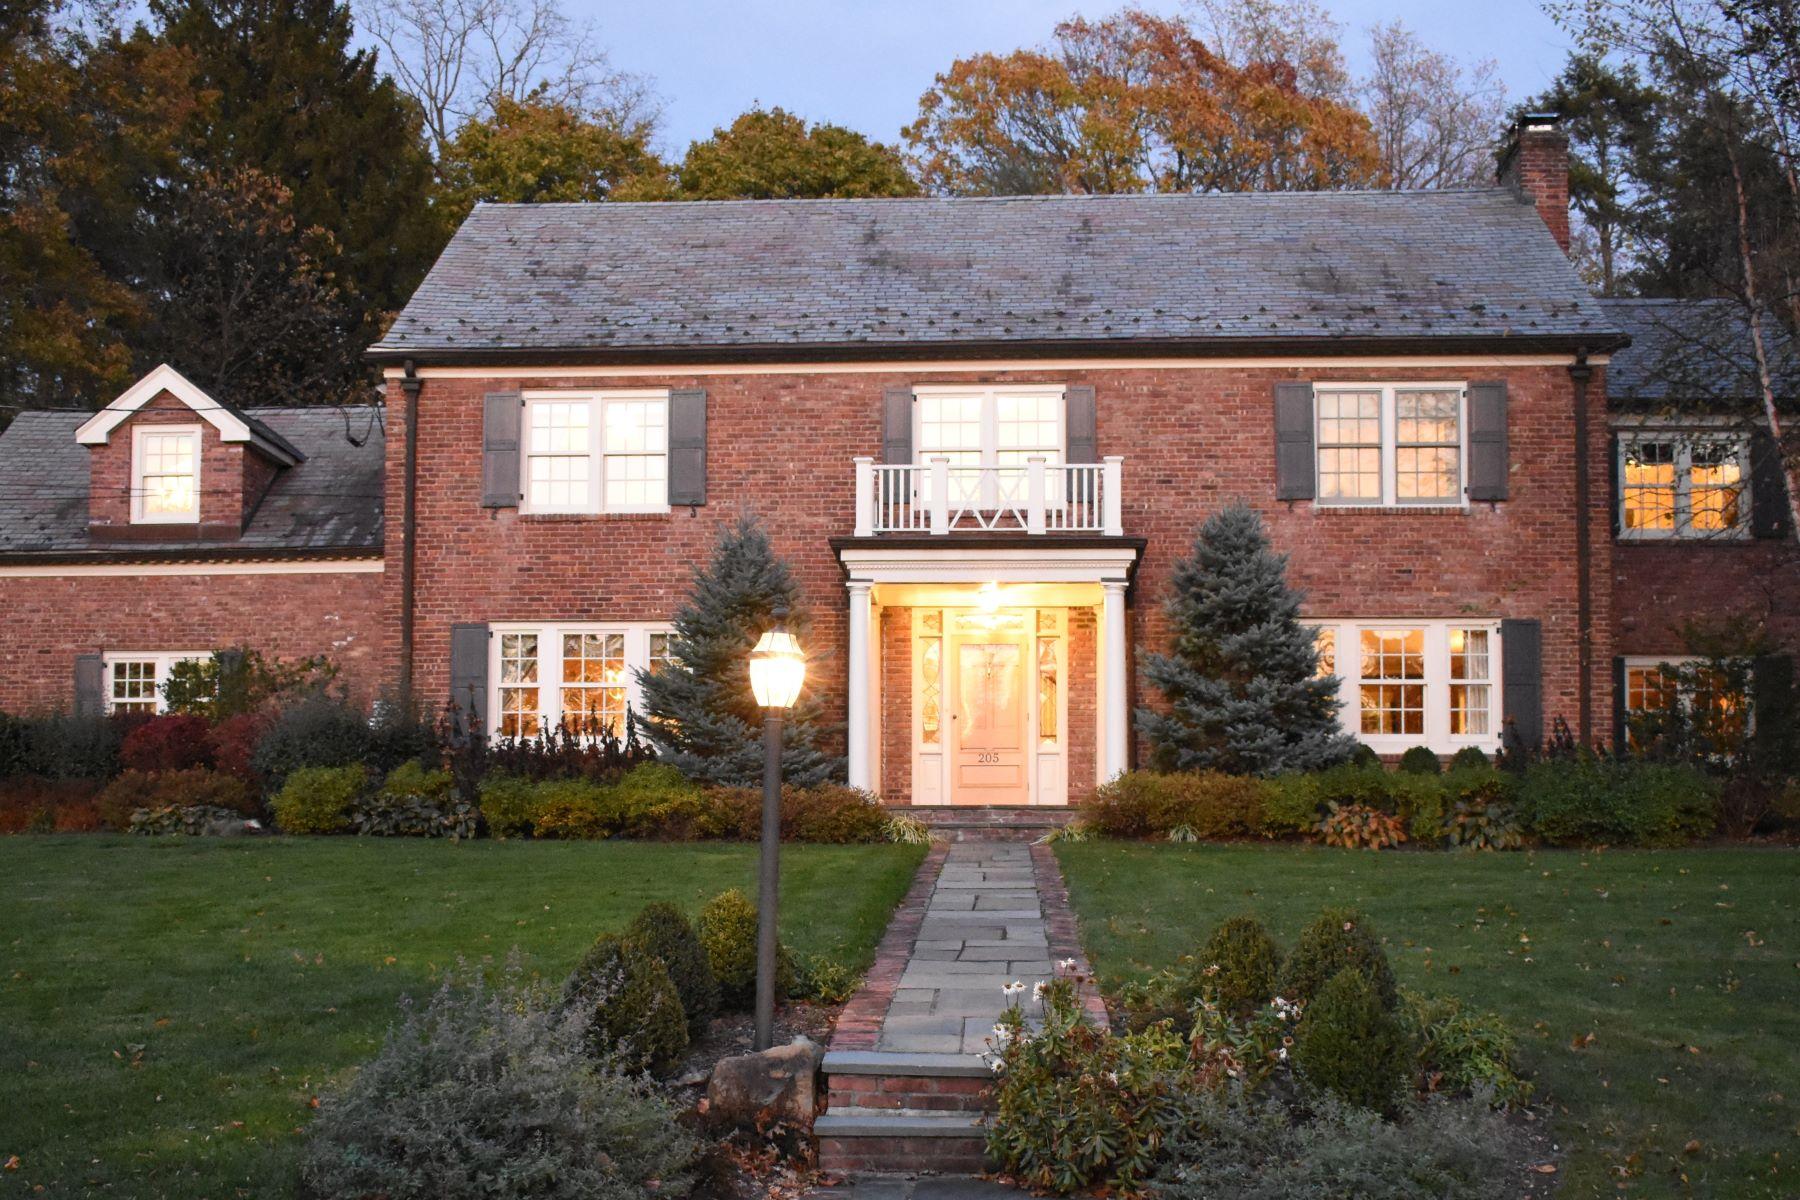 Single Family Homes for Sale at Manhasset 205 Circle Dr Manhasset, New York 11030 United States